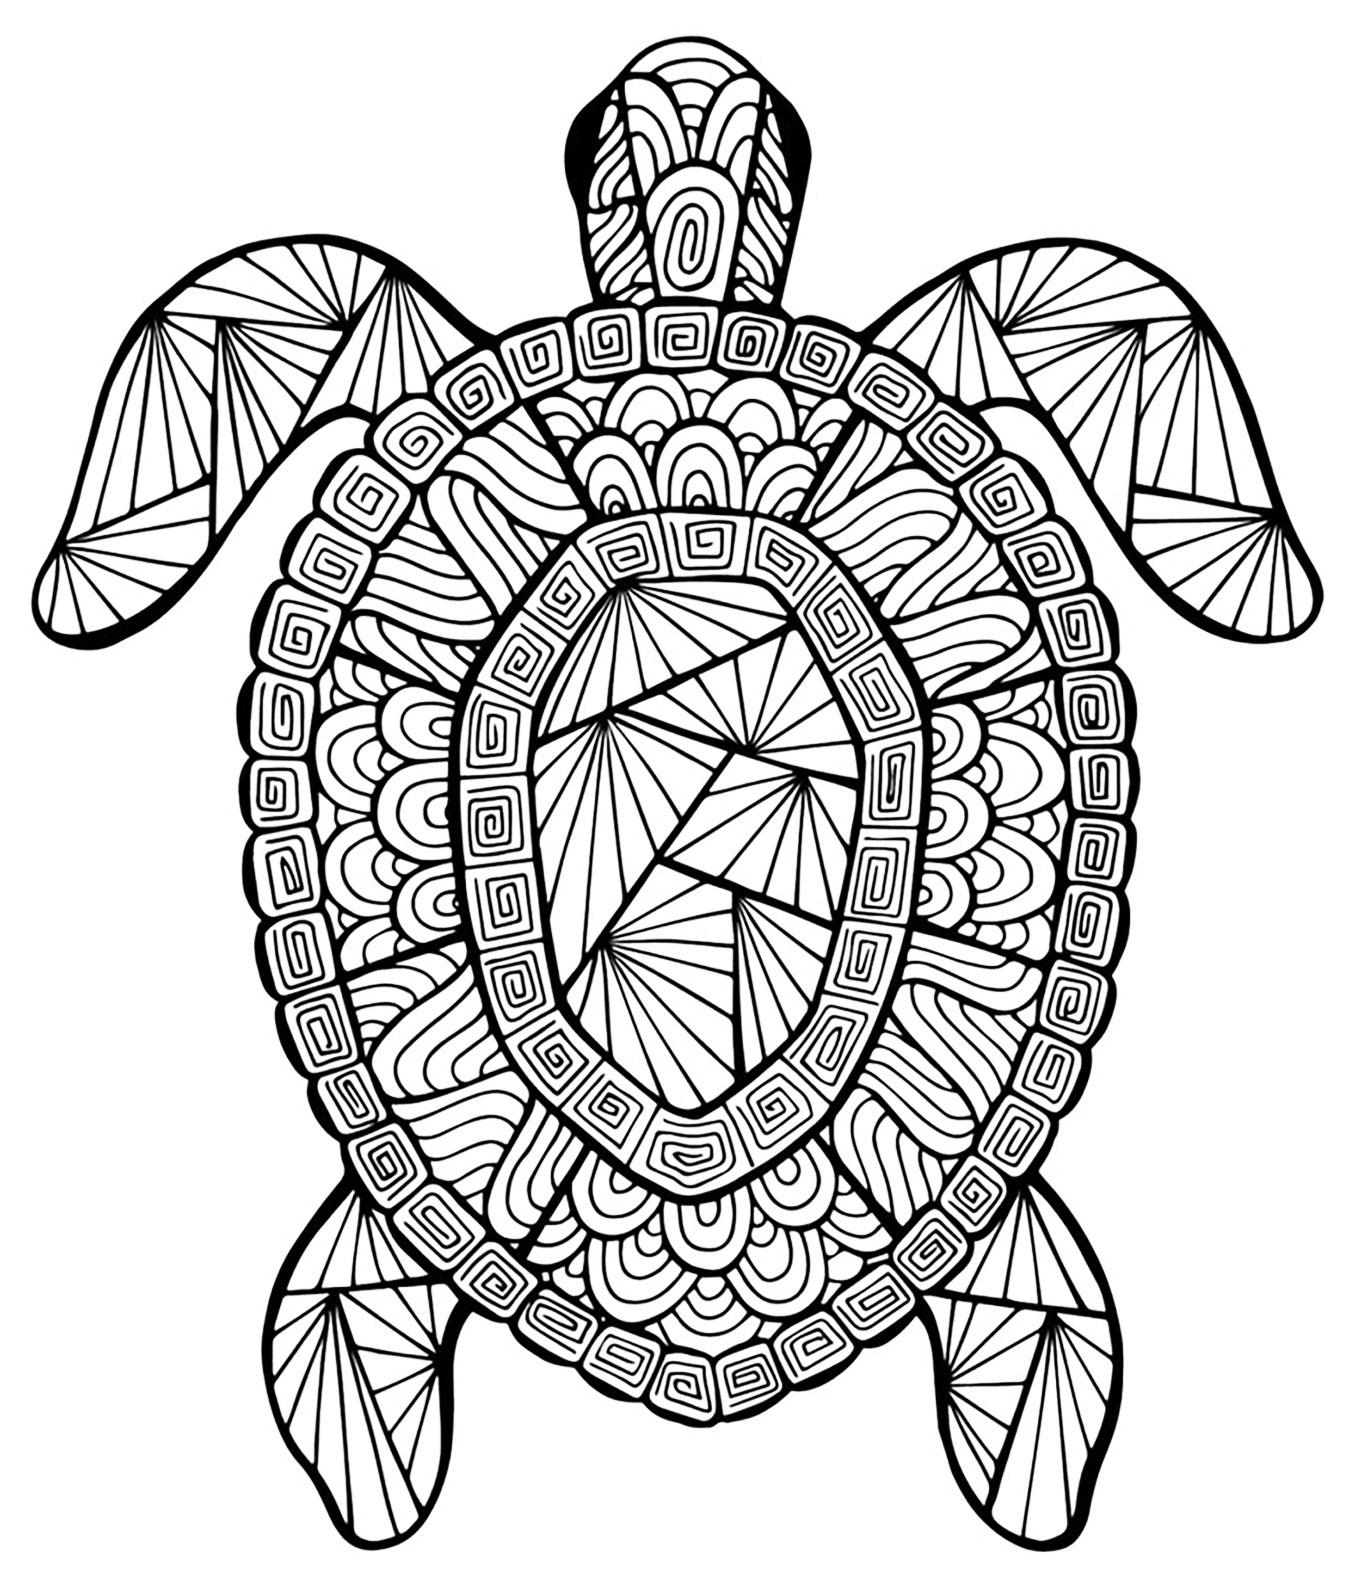 1357x1588 Turtles